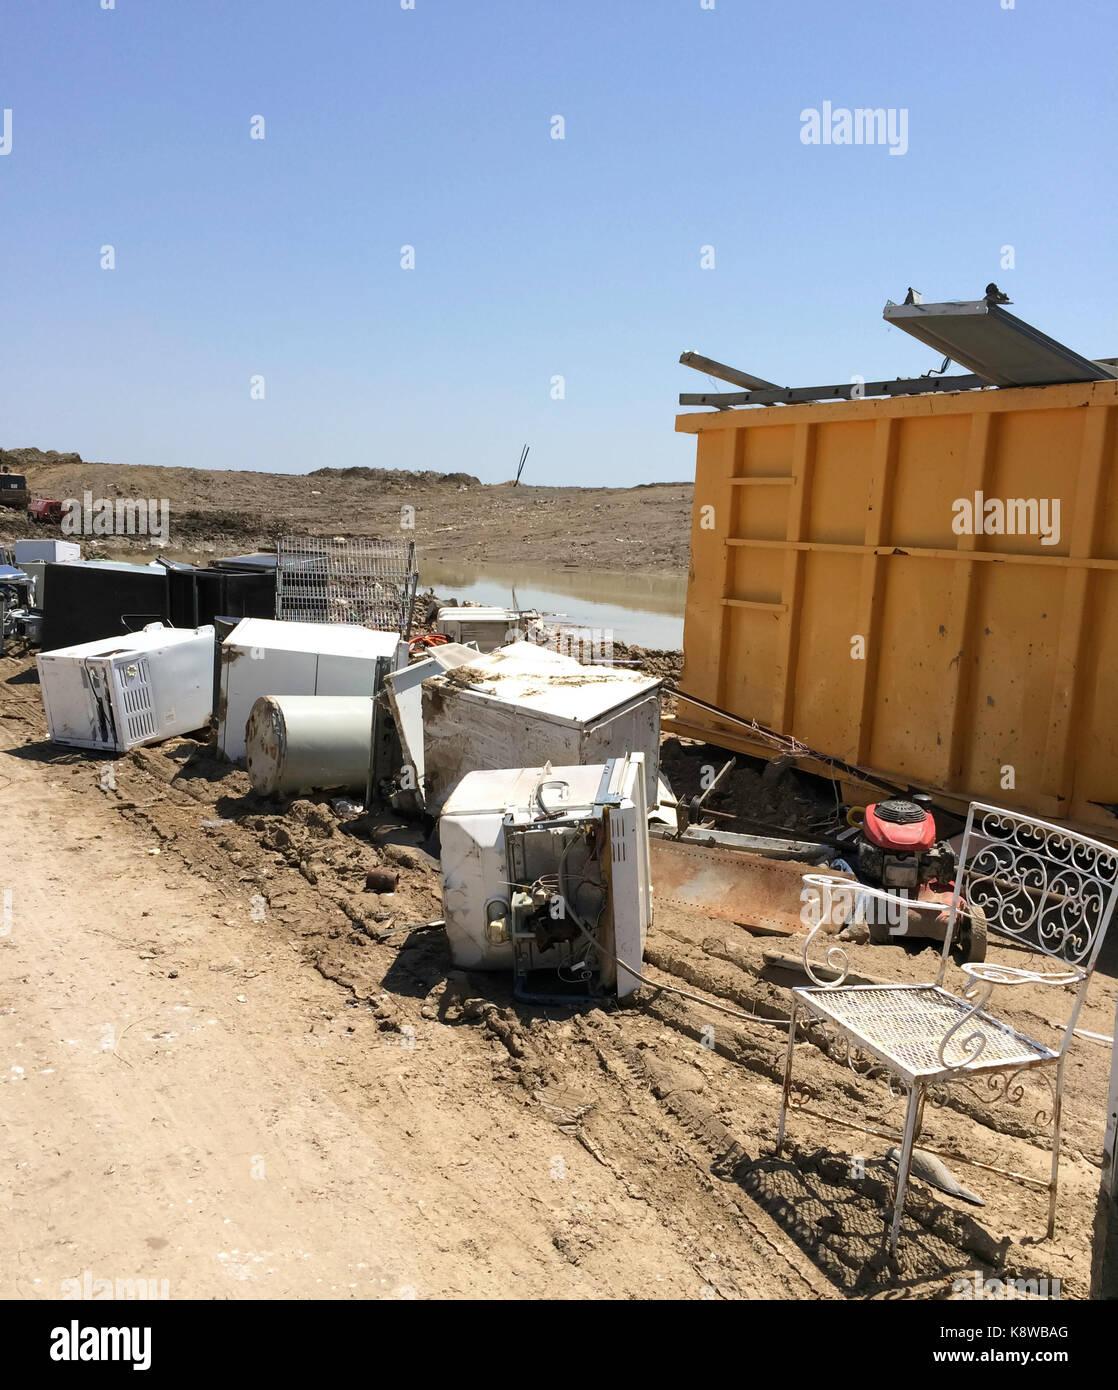 Landfill Trash Bin - Stock Image